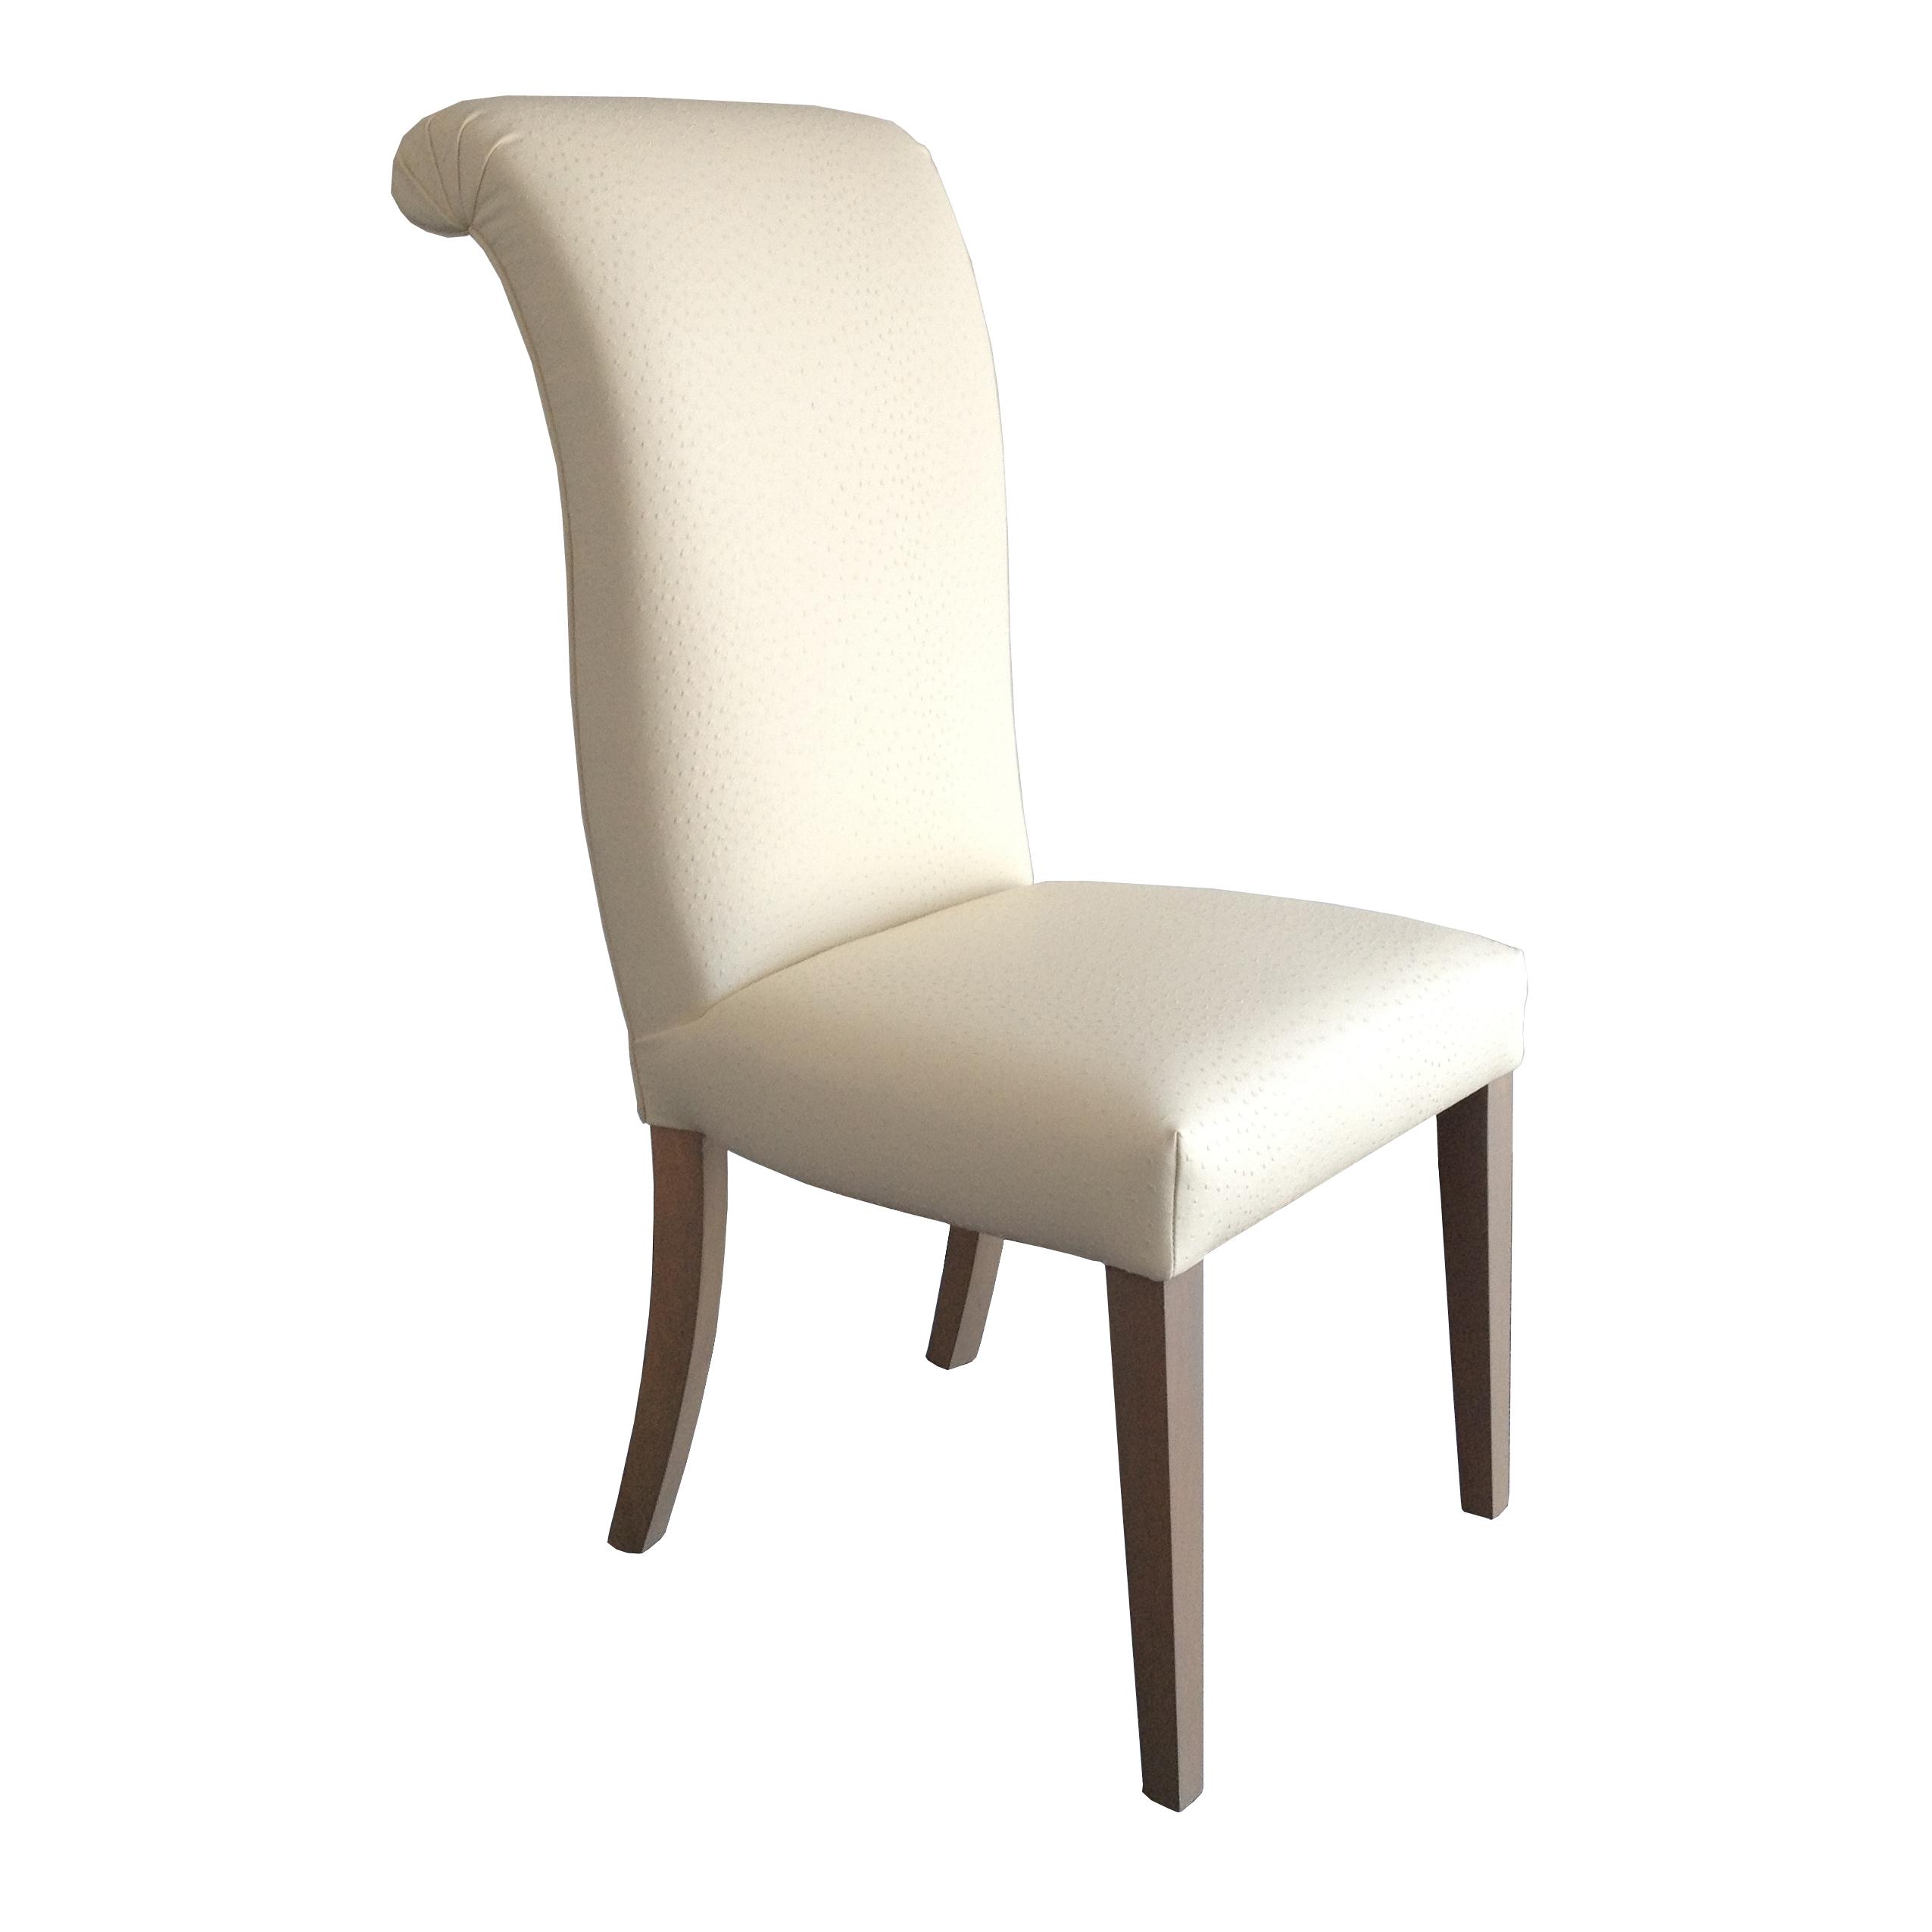 Maynards Dining Chair